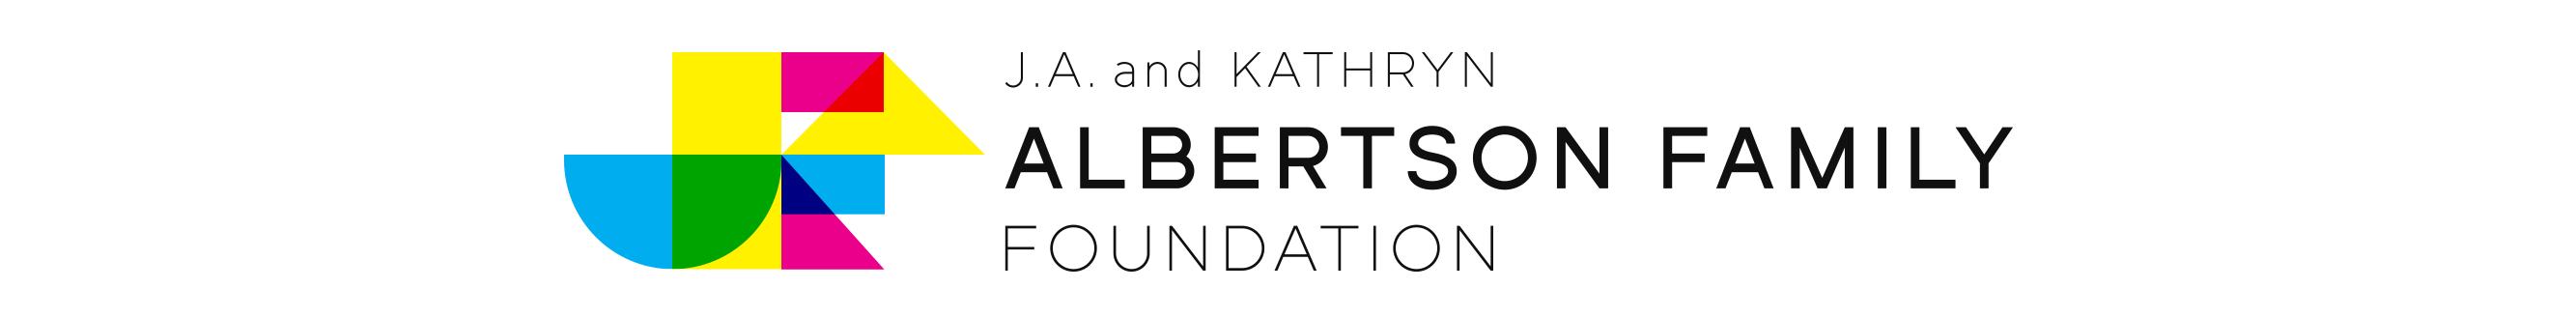 Albertson Family Foundation